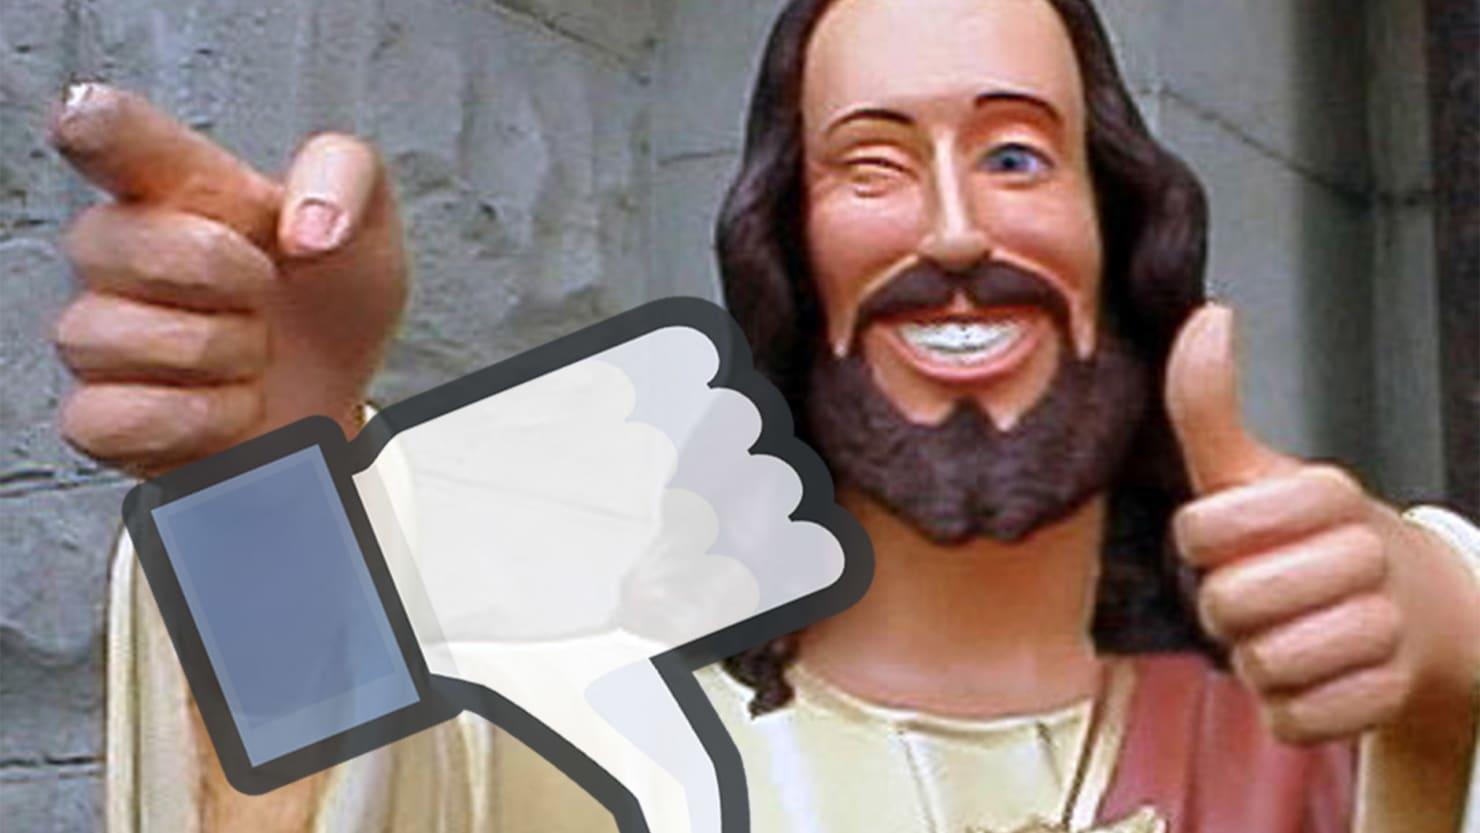 Why Are Millennials Unfriending Organized Religion?